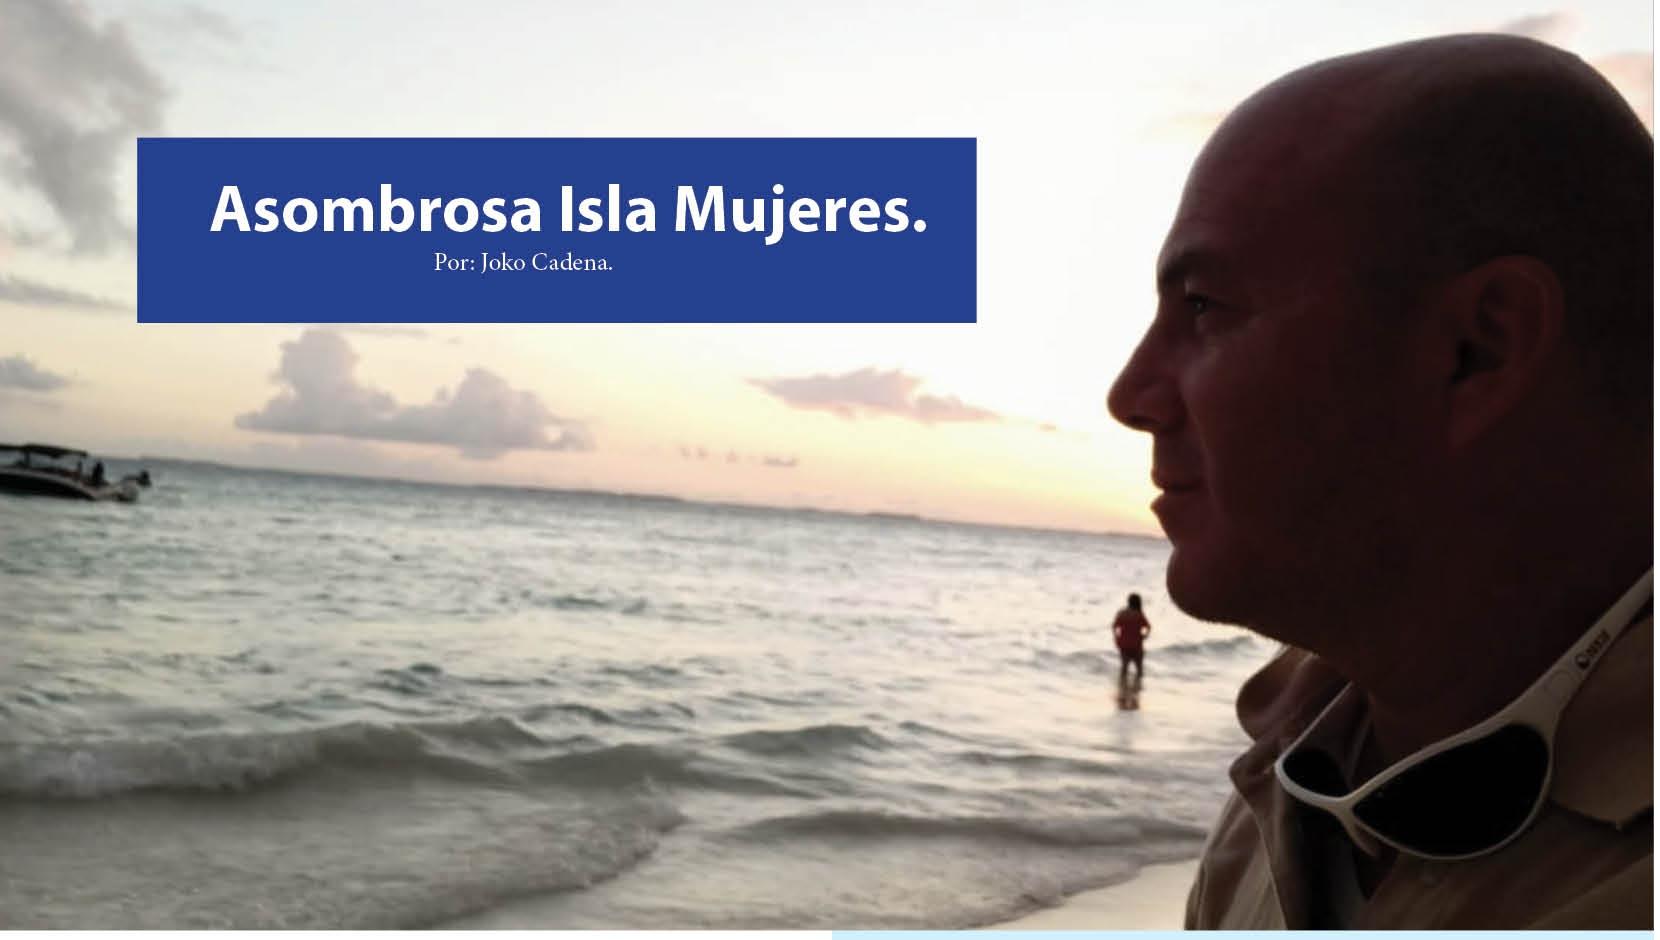 Asombrosa Isla Mujeres.